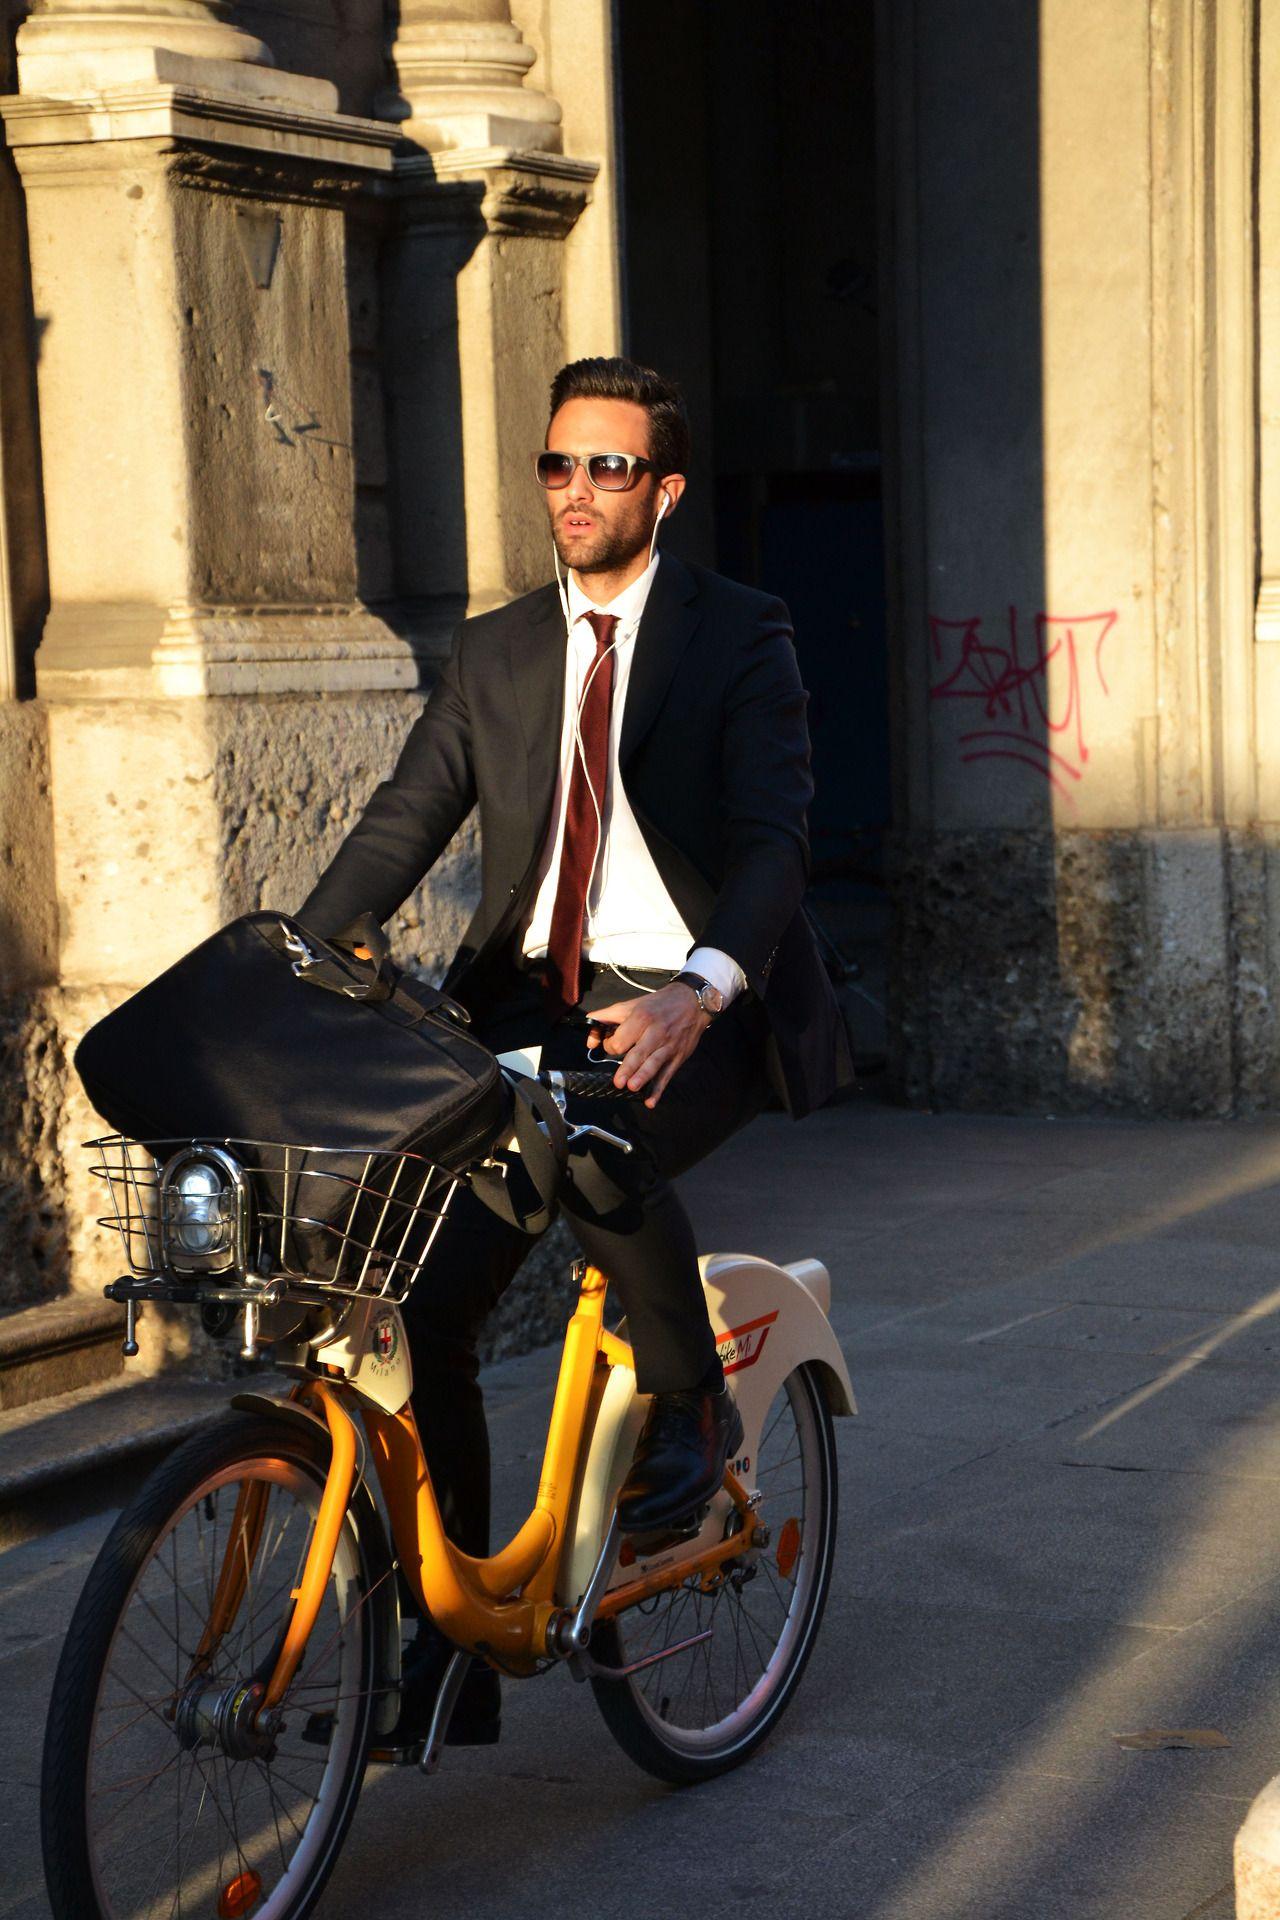 Bicicleta amarela & fato.